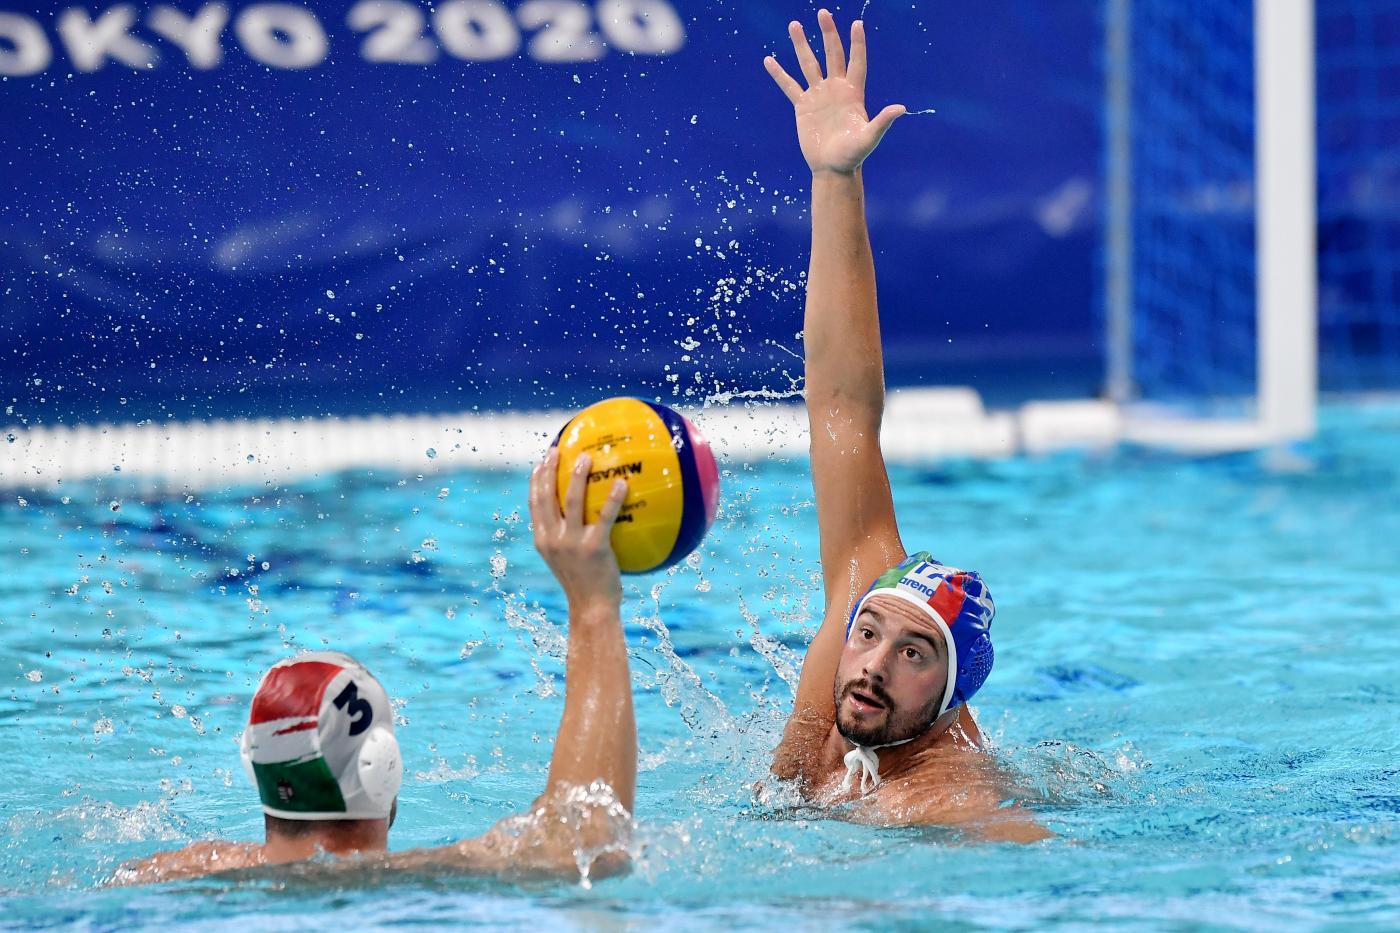 VIDEO Italia Ungheria 5 5 pallanuoto, Olimpiadi Tokyo: highlights e sintesi